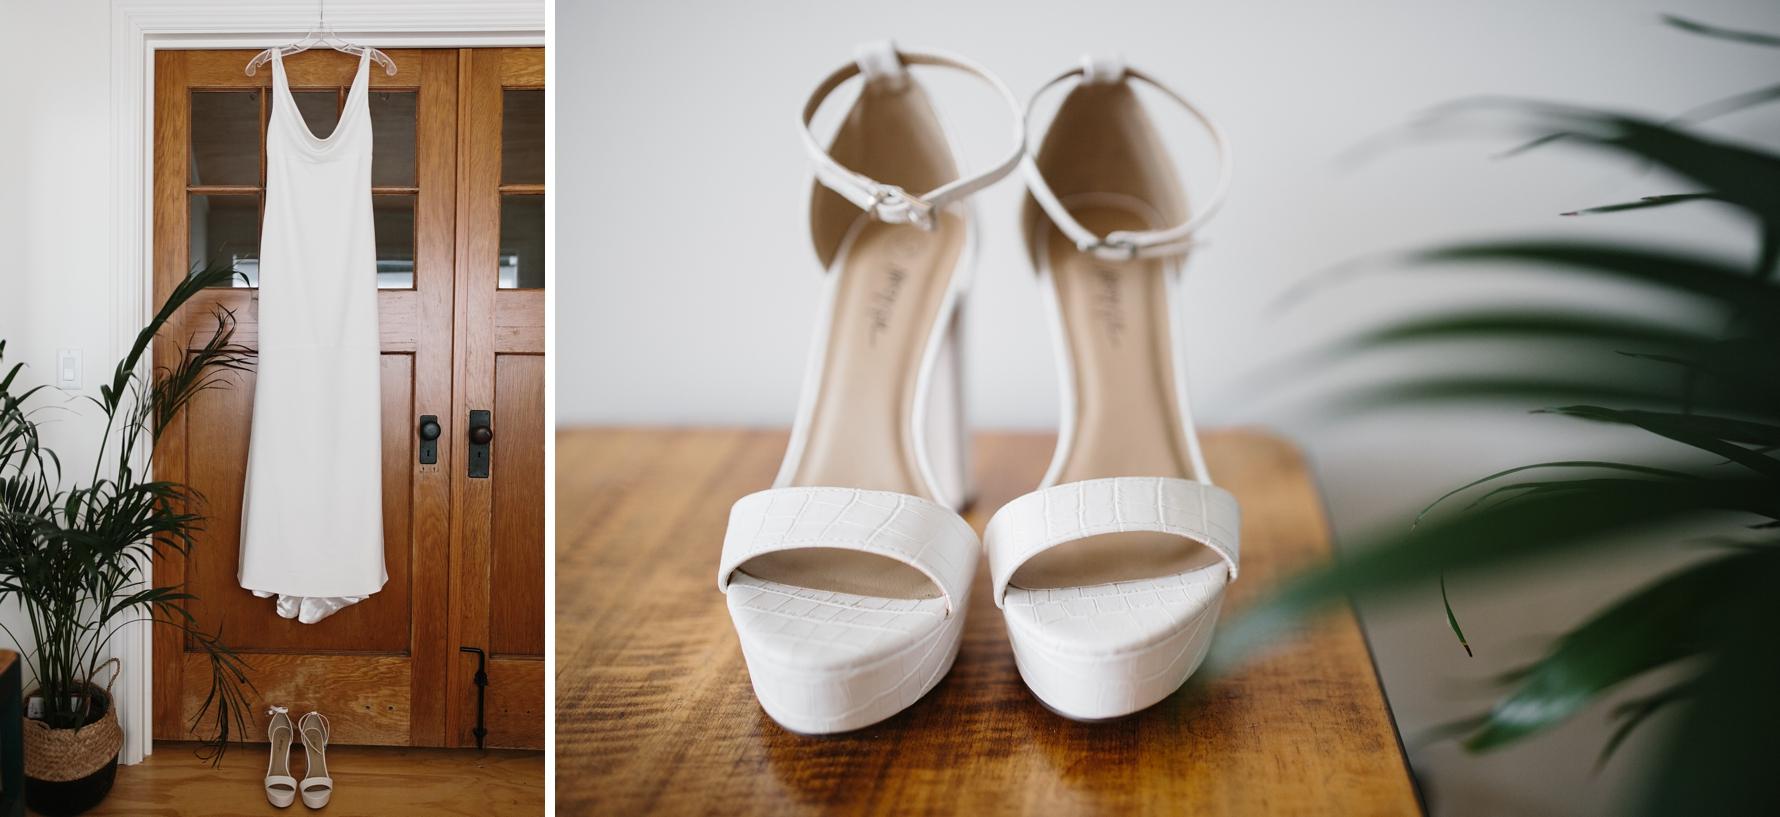 norris-traverse-city-wedding-08.JPG